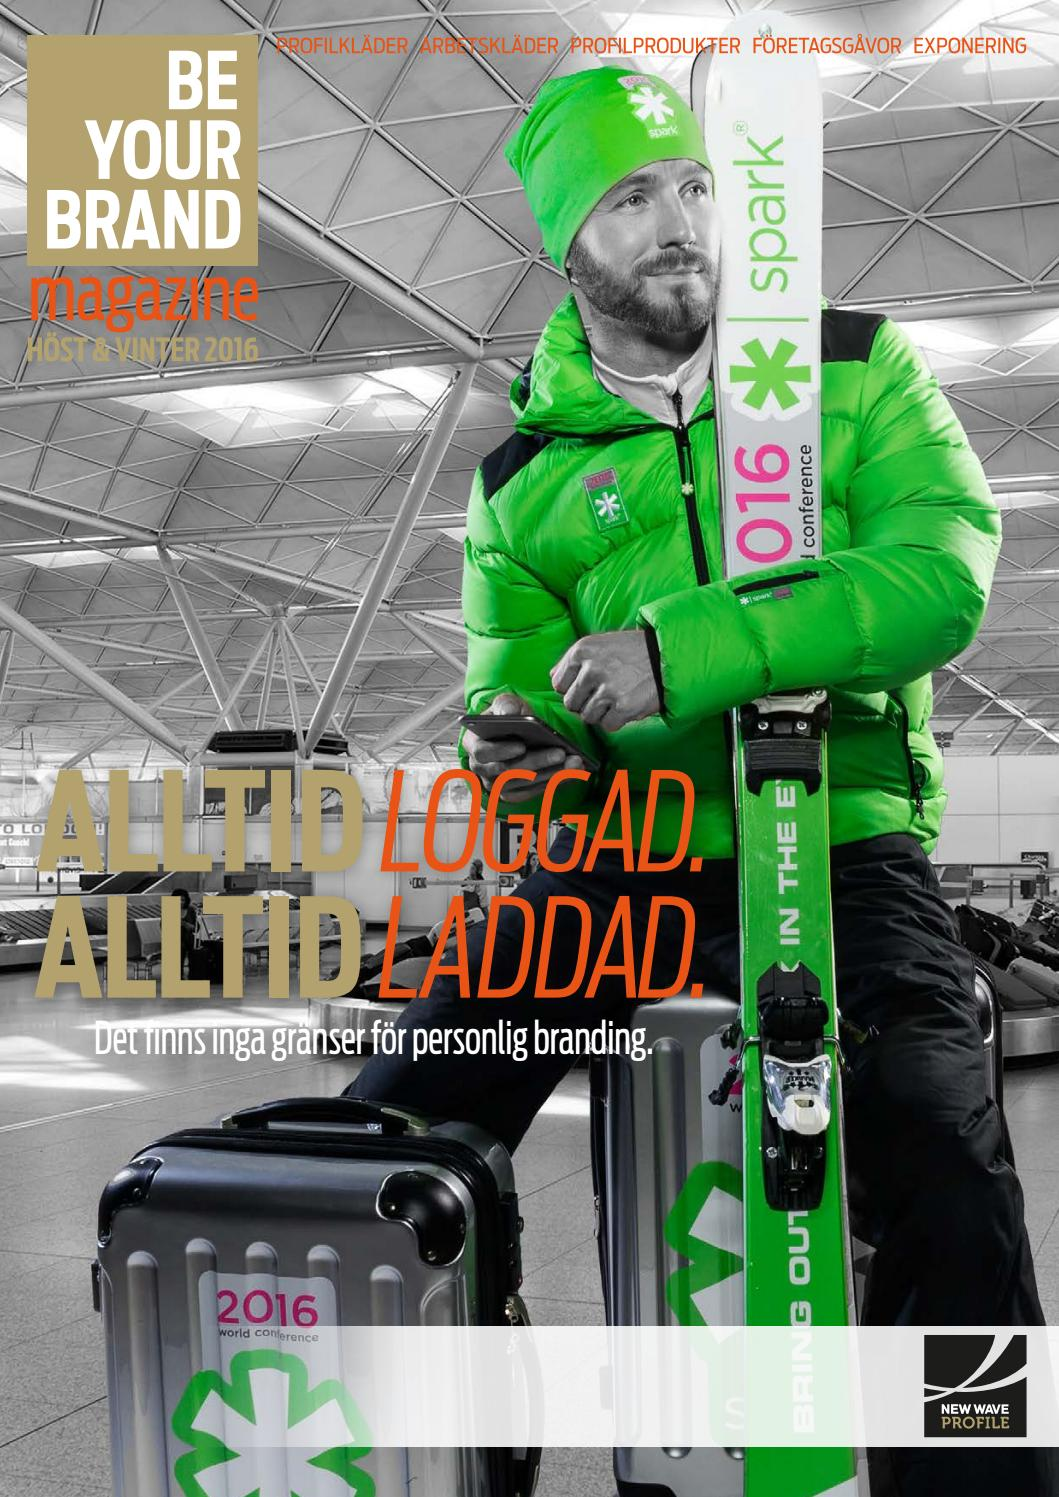 BeYourBrand Magazine AW2016 Gewe Promotion by Gewe Promotion - issuu 3c7aa3cb1584d